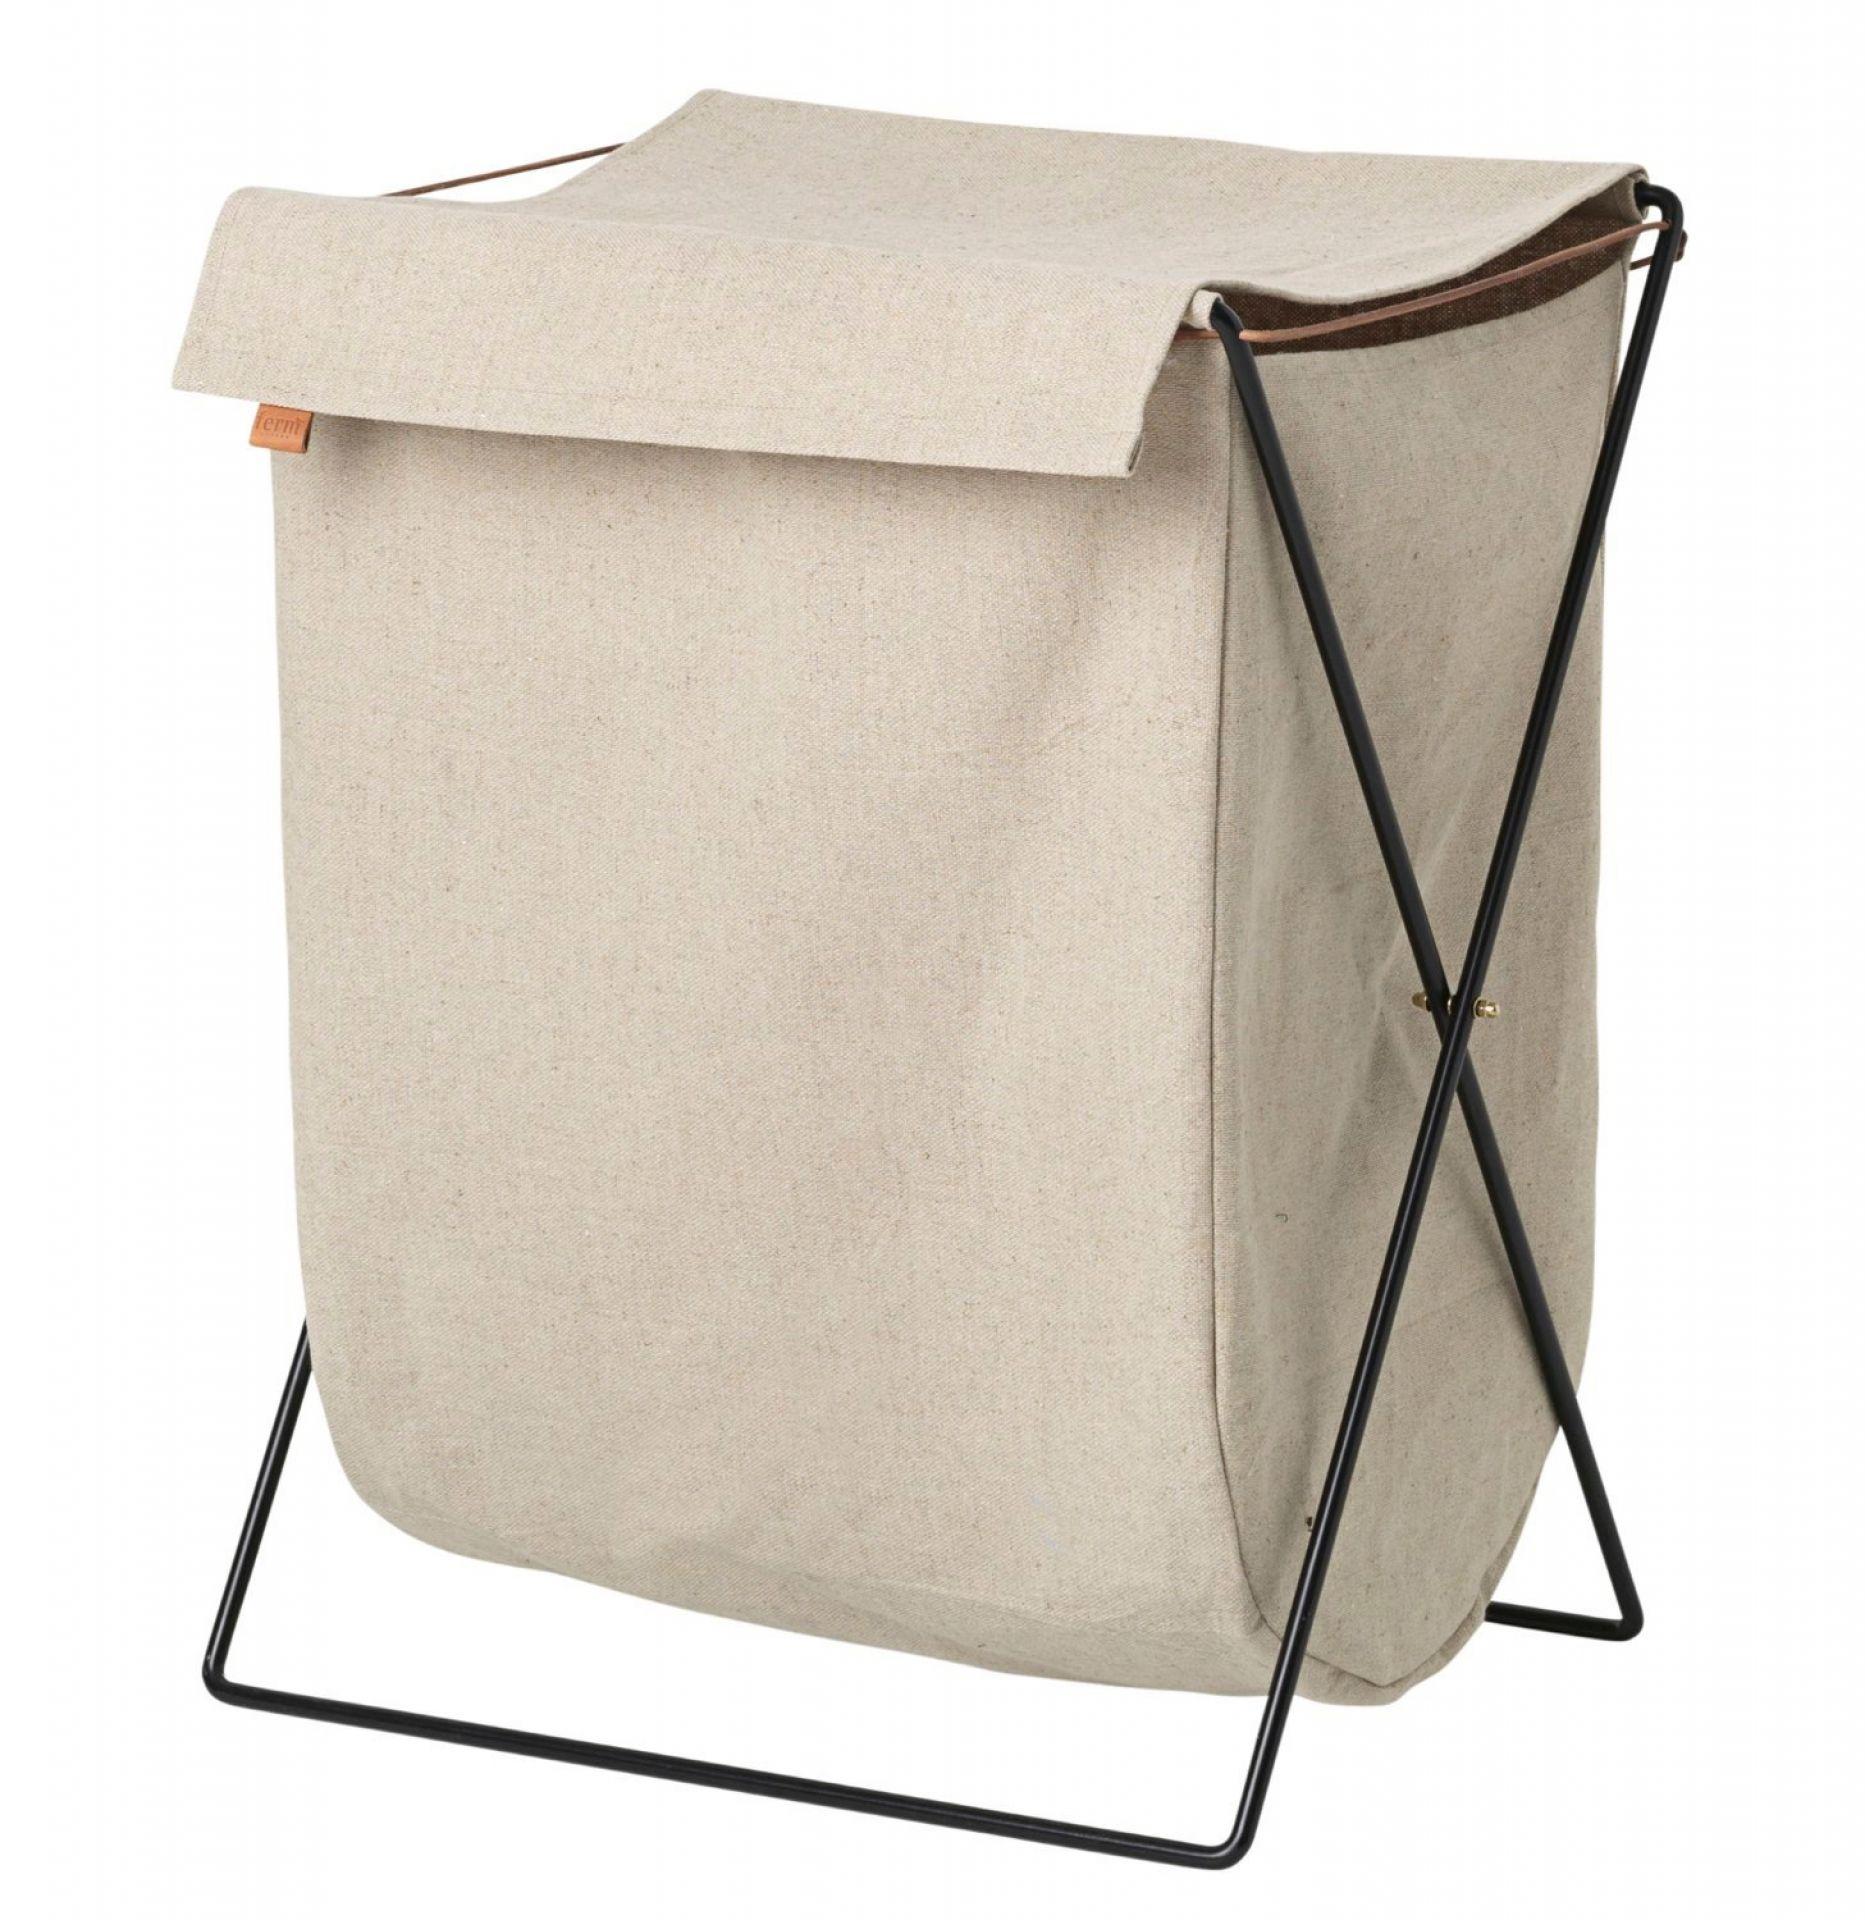 Herman Laundry Stand Wäschekorb Ferm Living